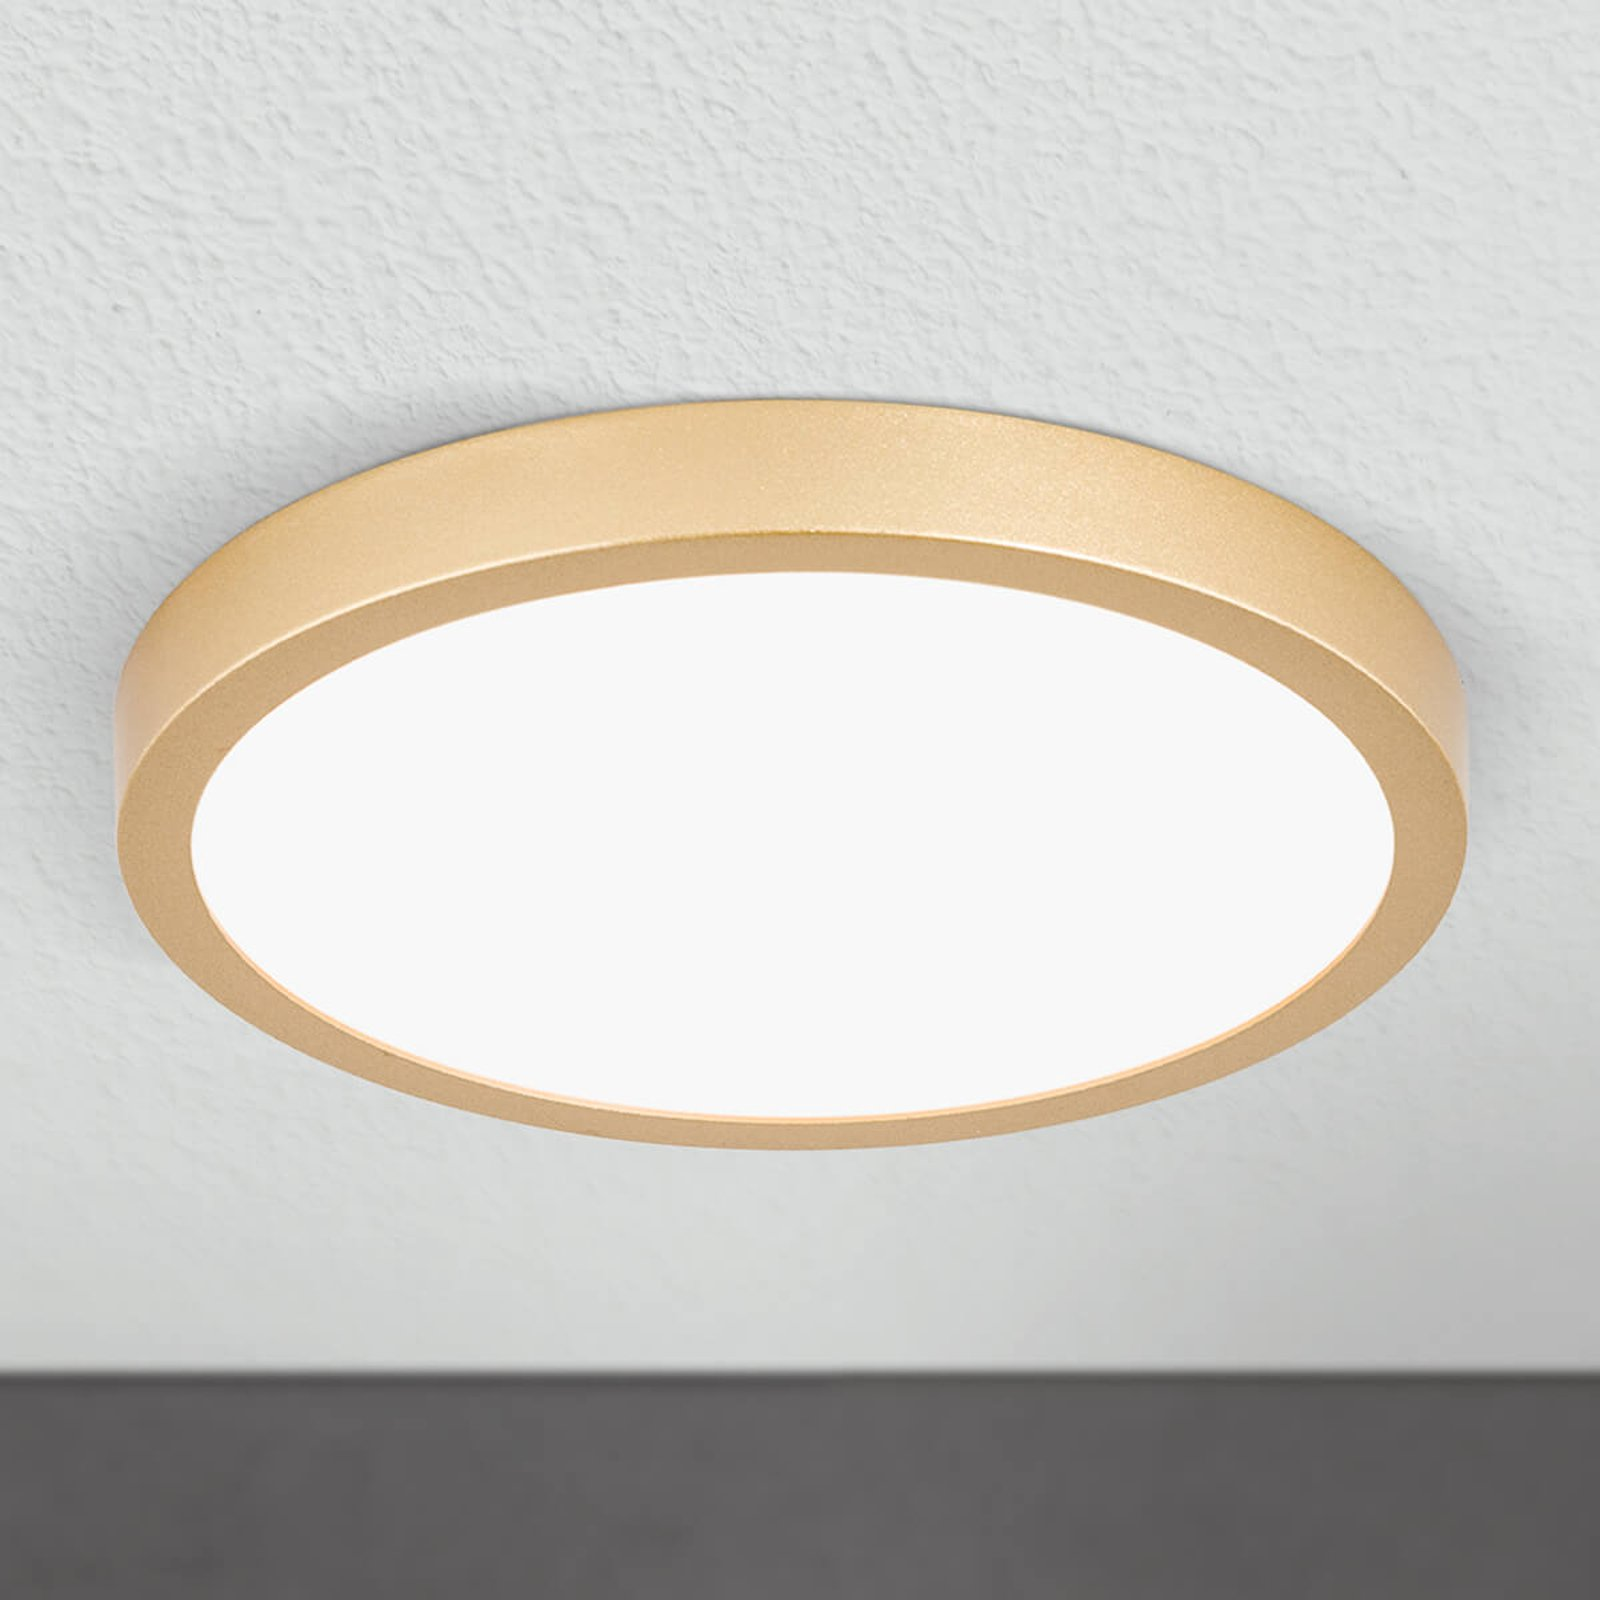 LED-taklampe Vika, rund, gull matt, Ø 23cm